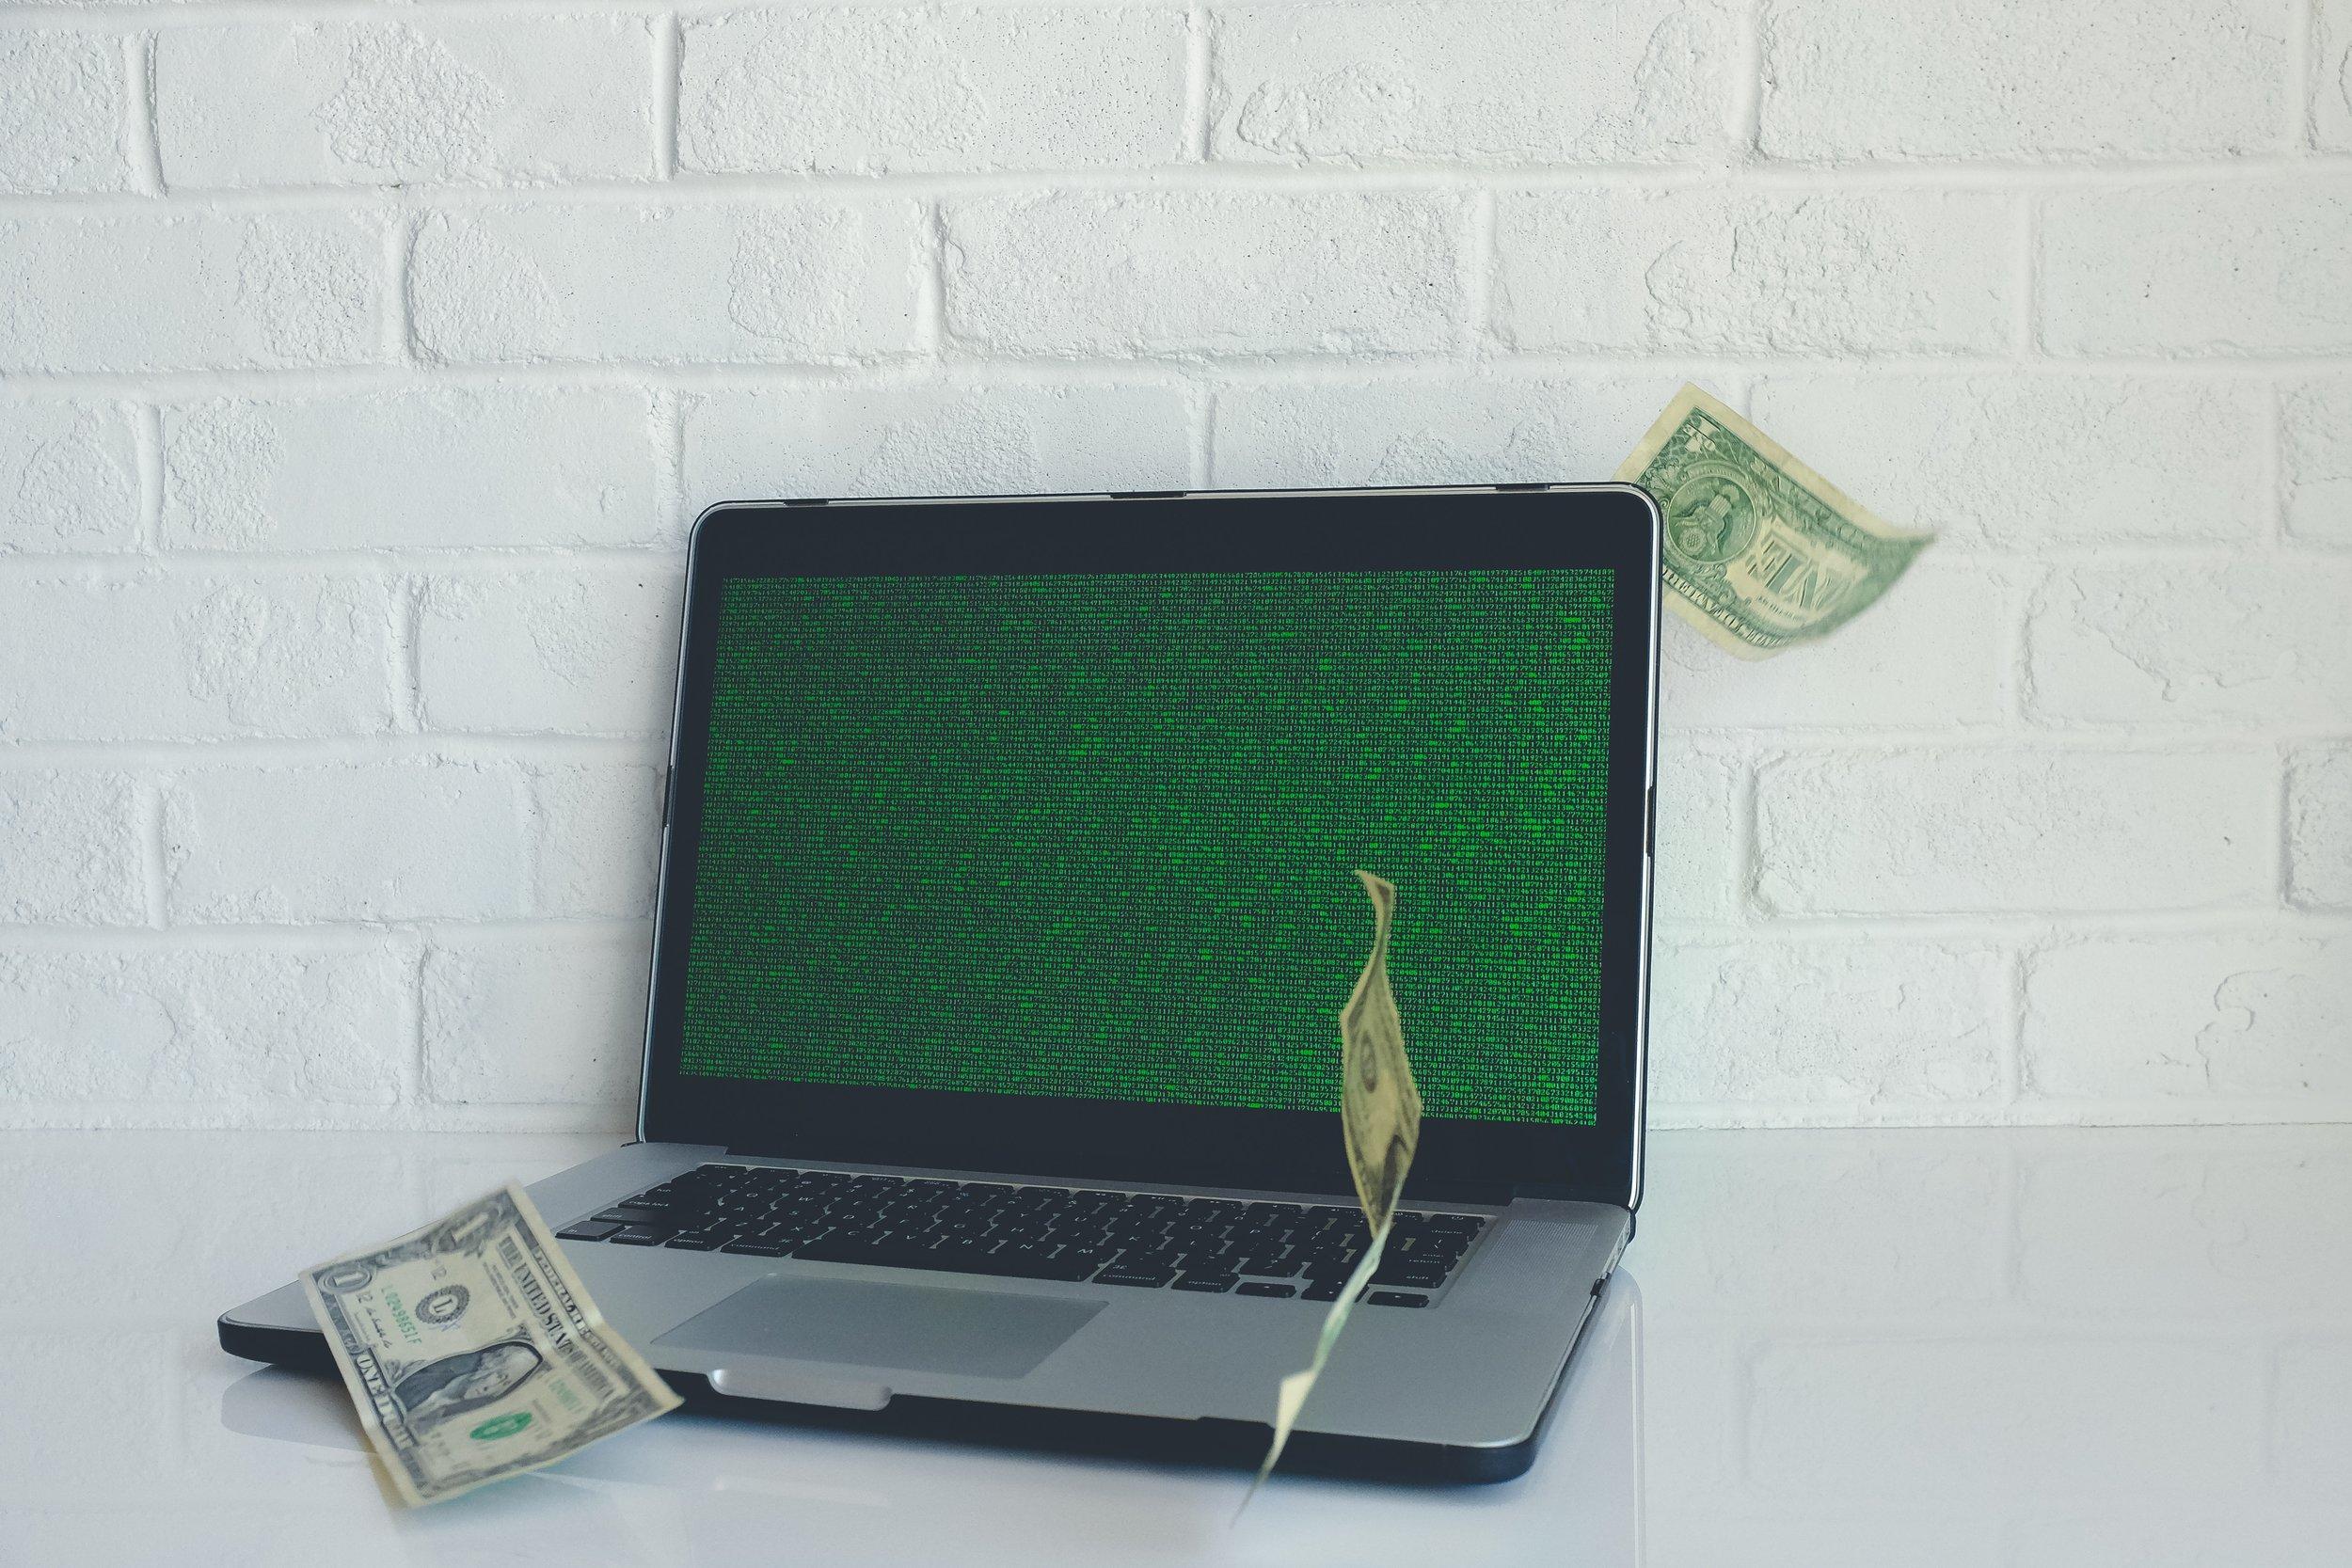 laptop sa zelenom podlogom i novcem.jpg